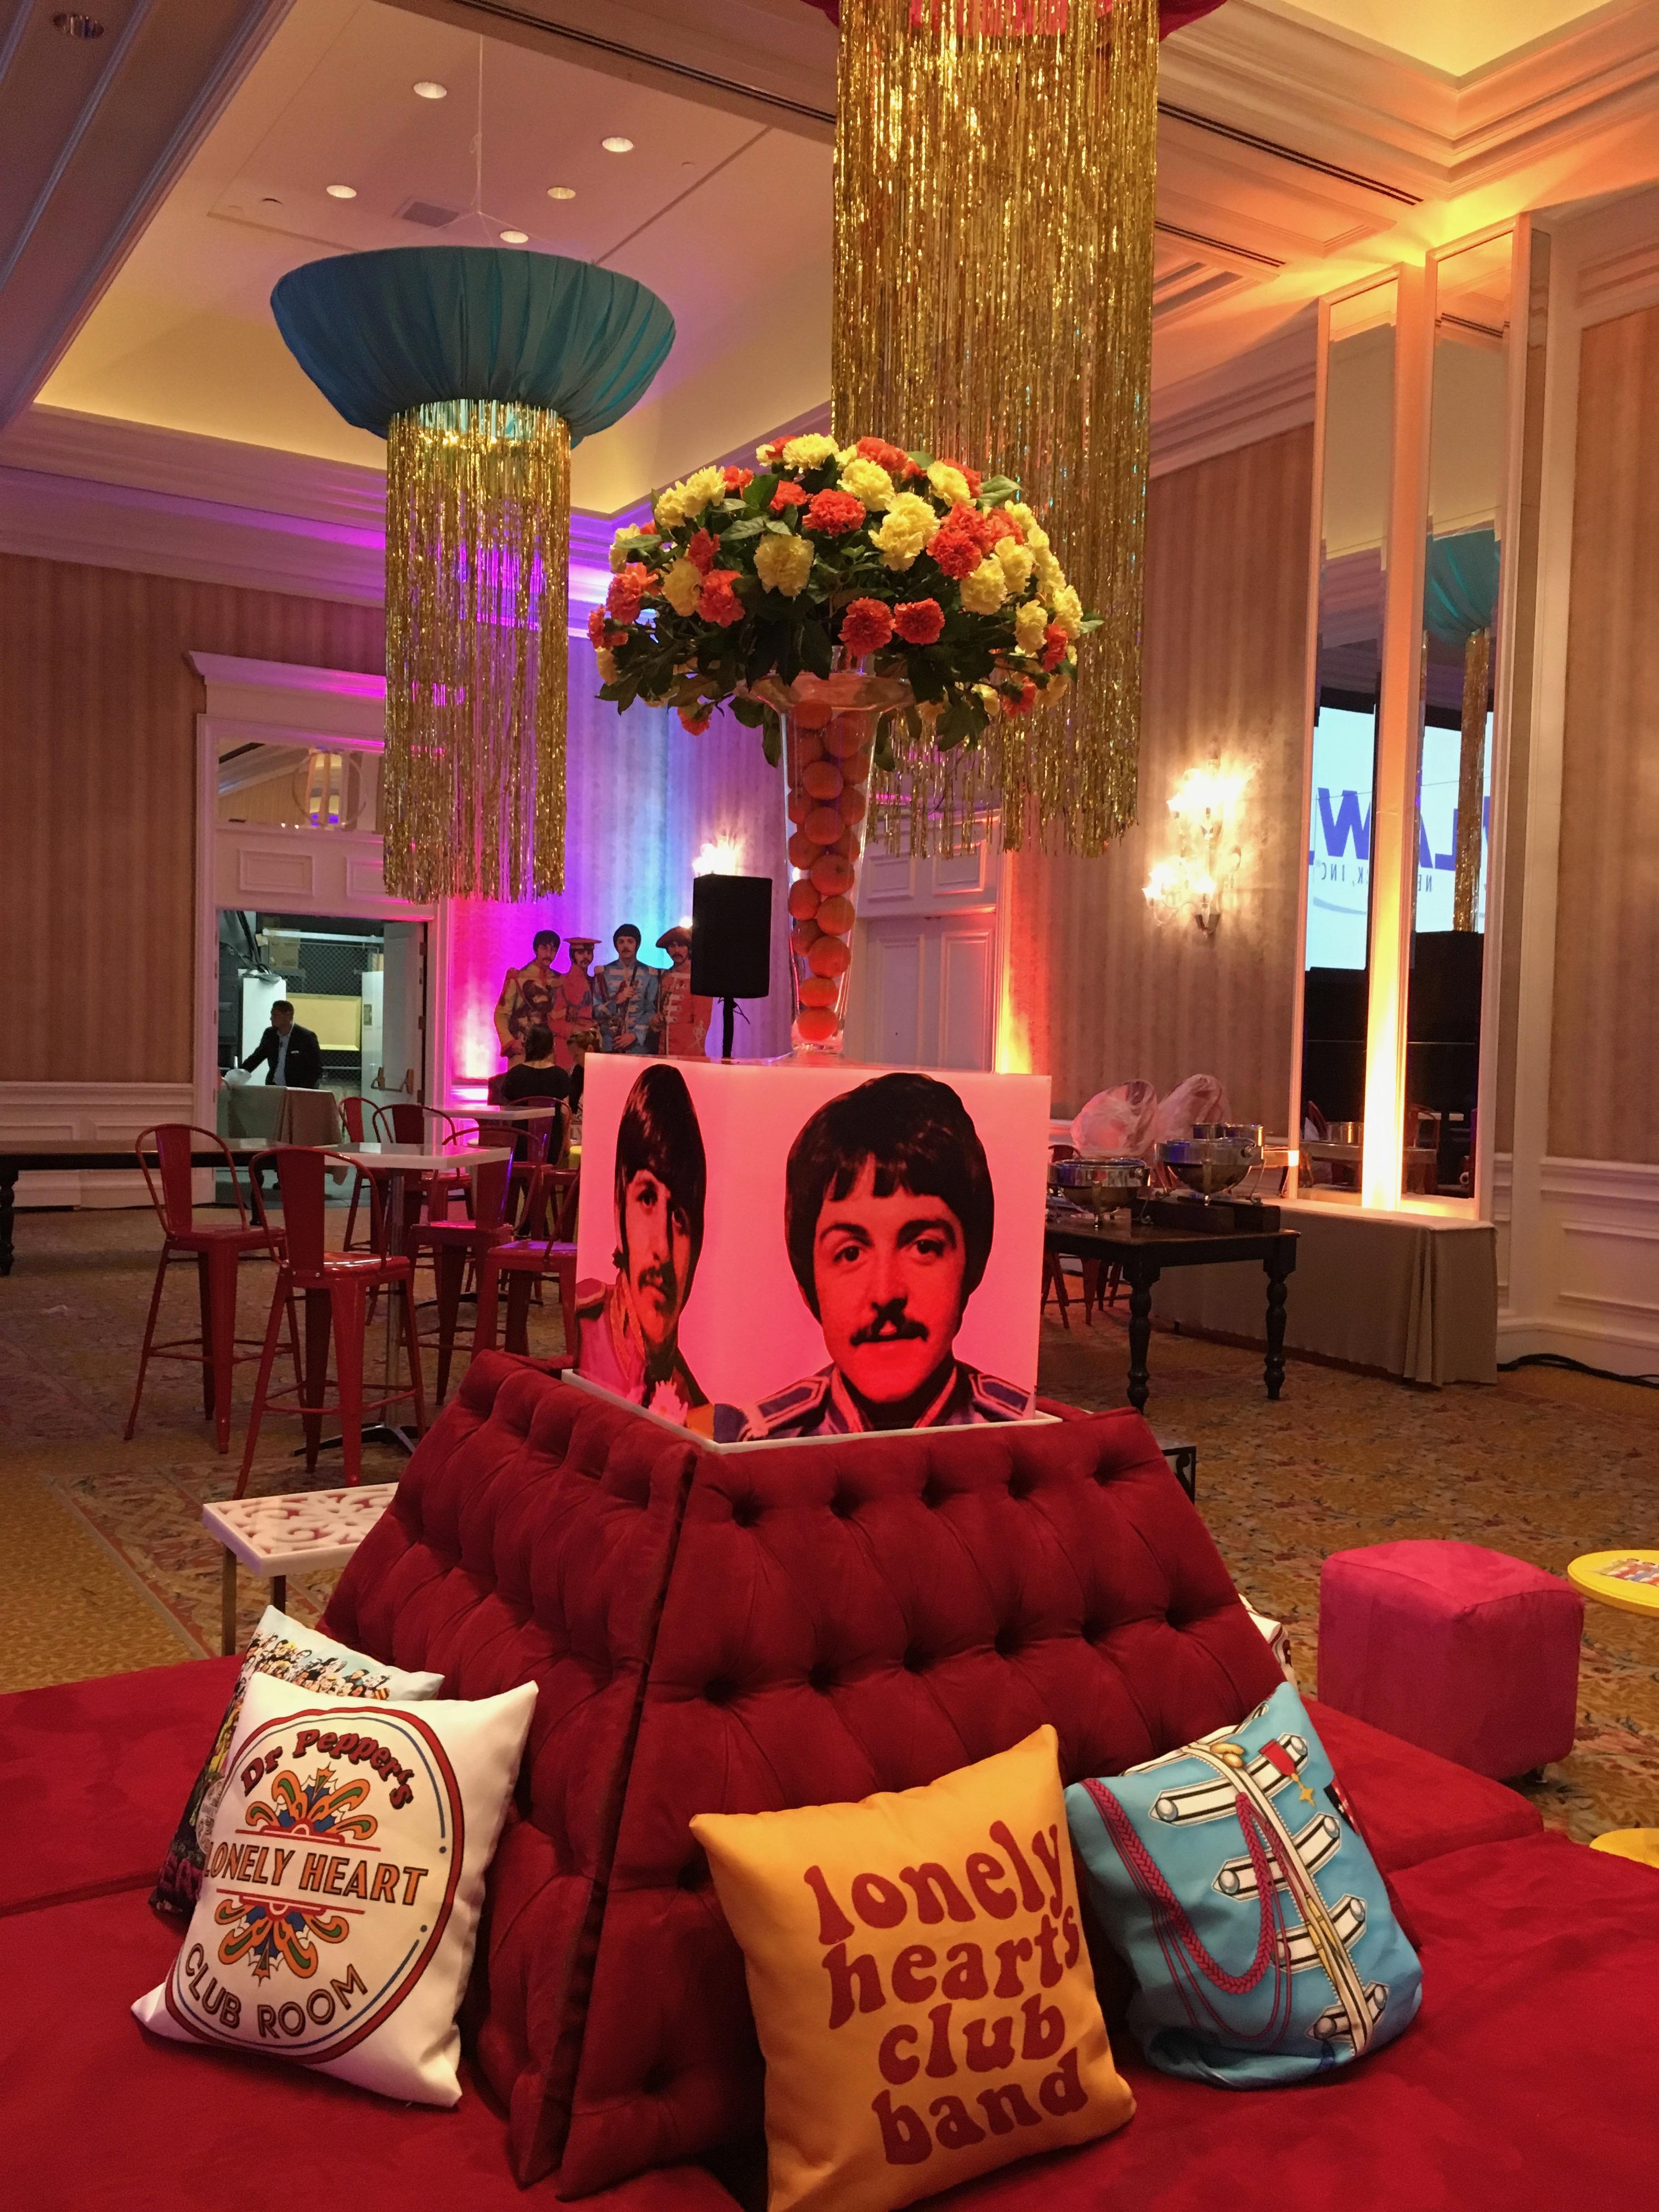 Beatles Tribute - Fox Design Firm